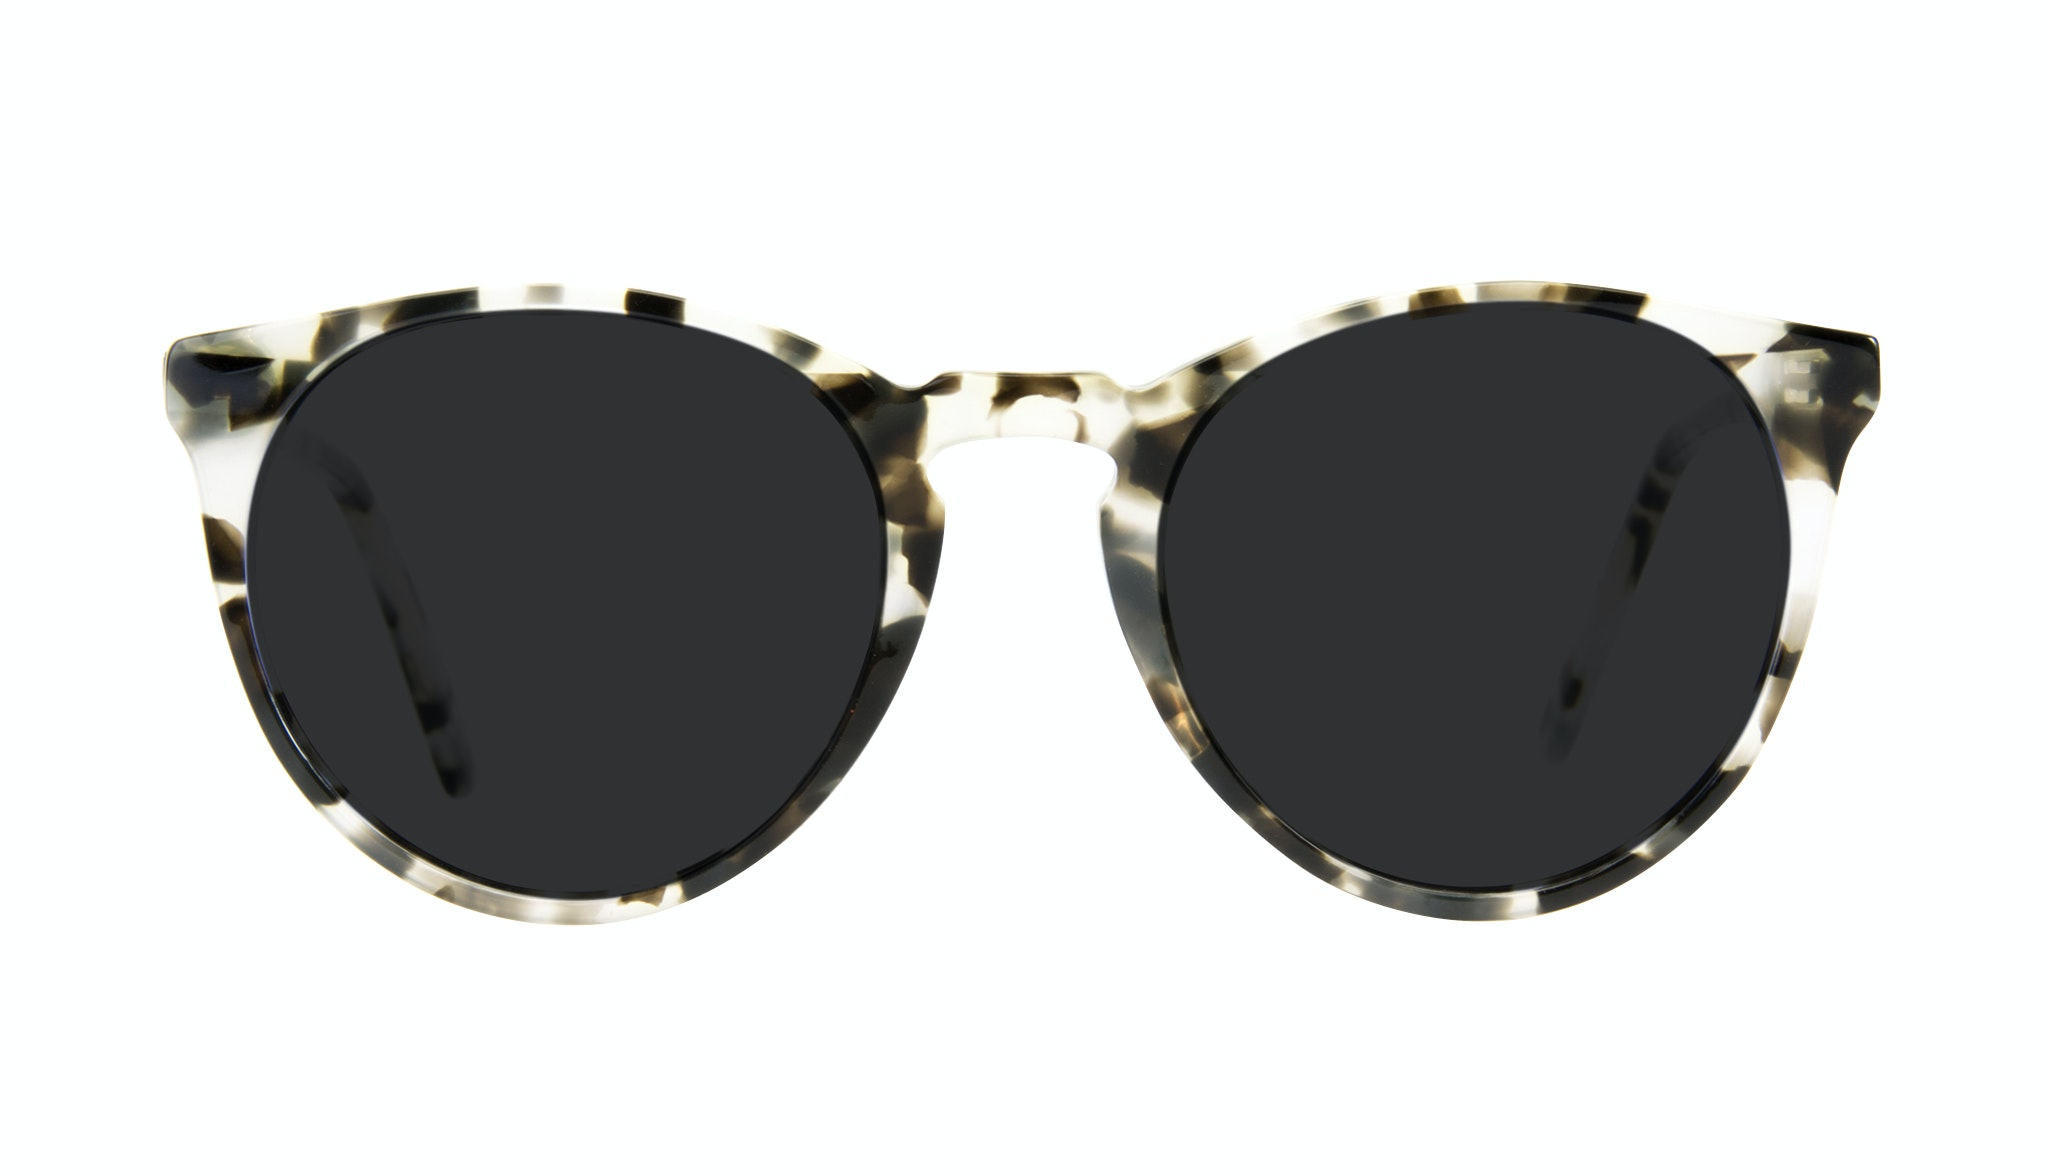 Affordable Fashion Glasses Round Sunglasses Men Arch Camo Tort